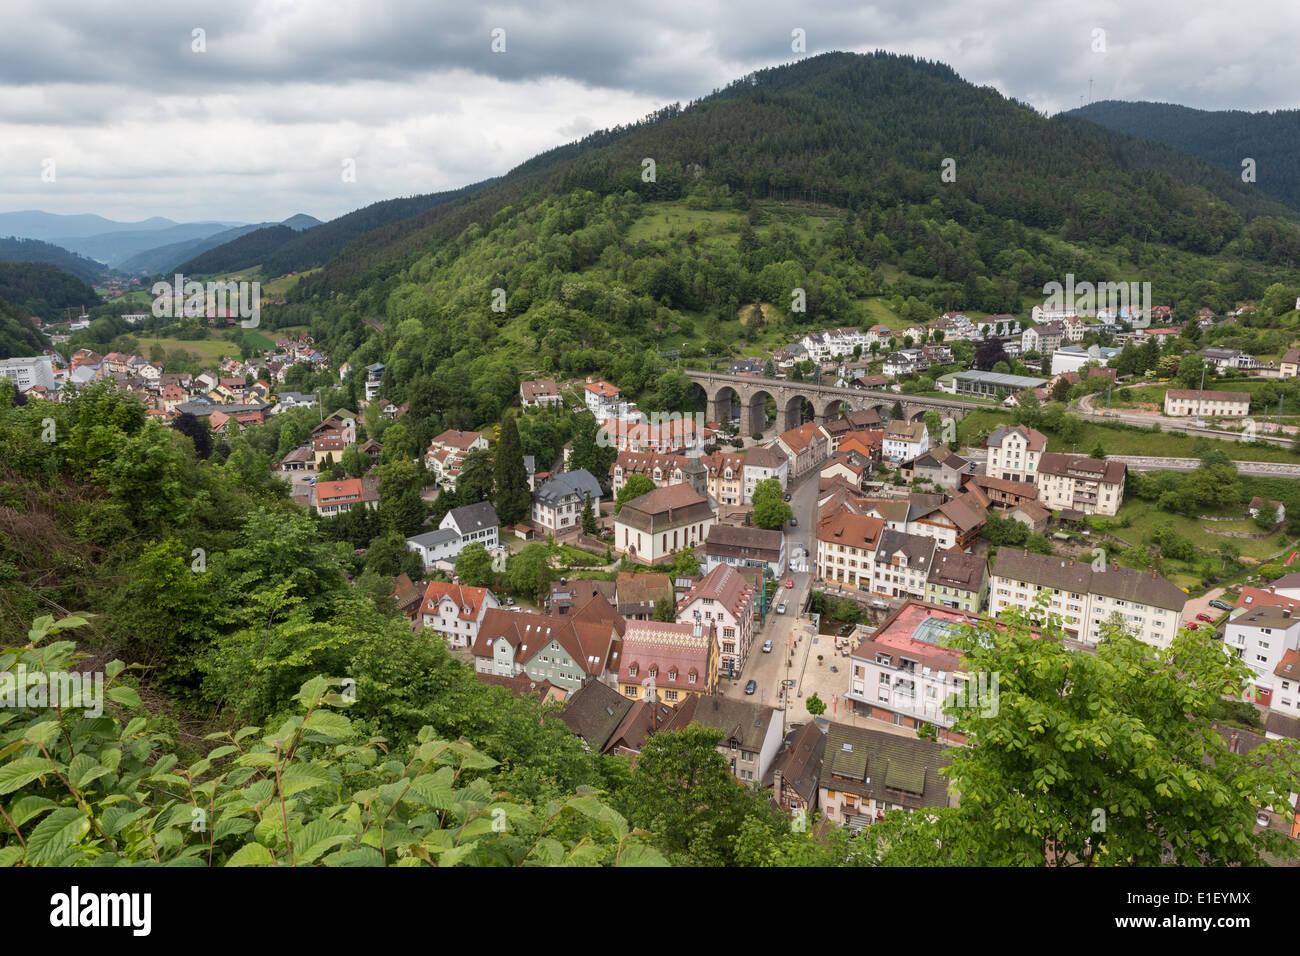 a-view-of-hornberg-baden-wurttemberg-ger